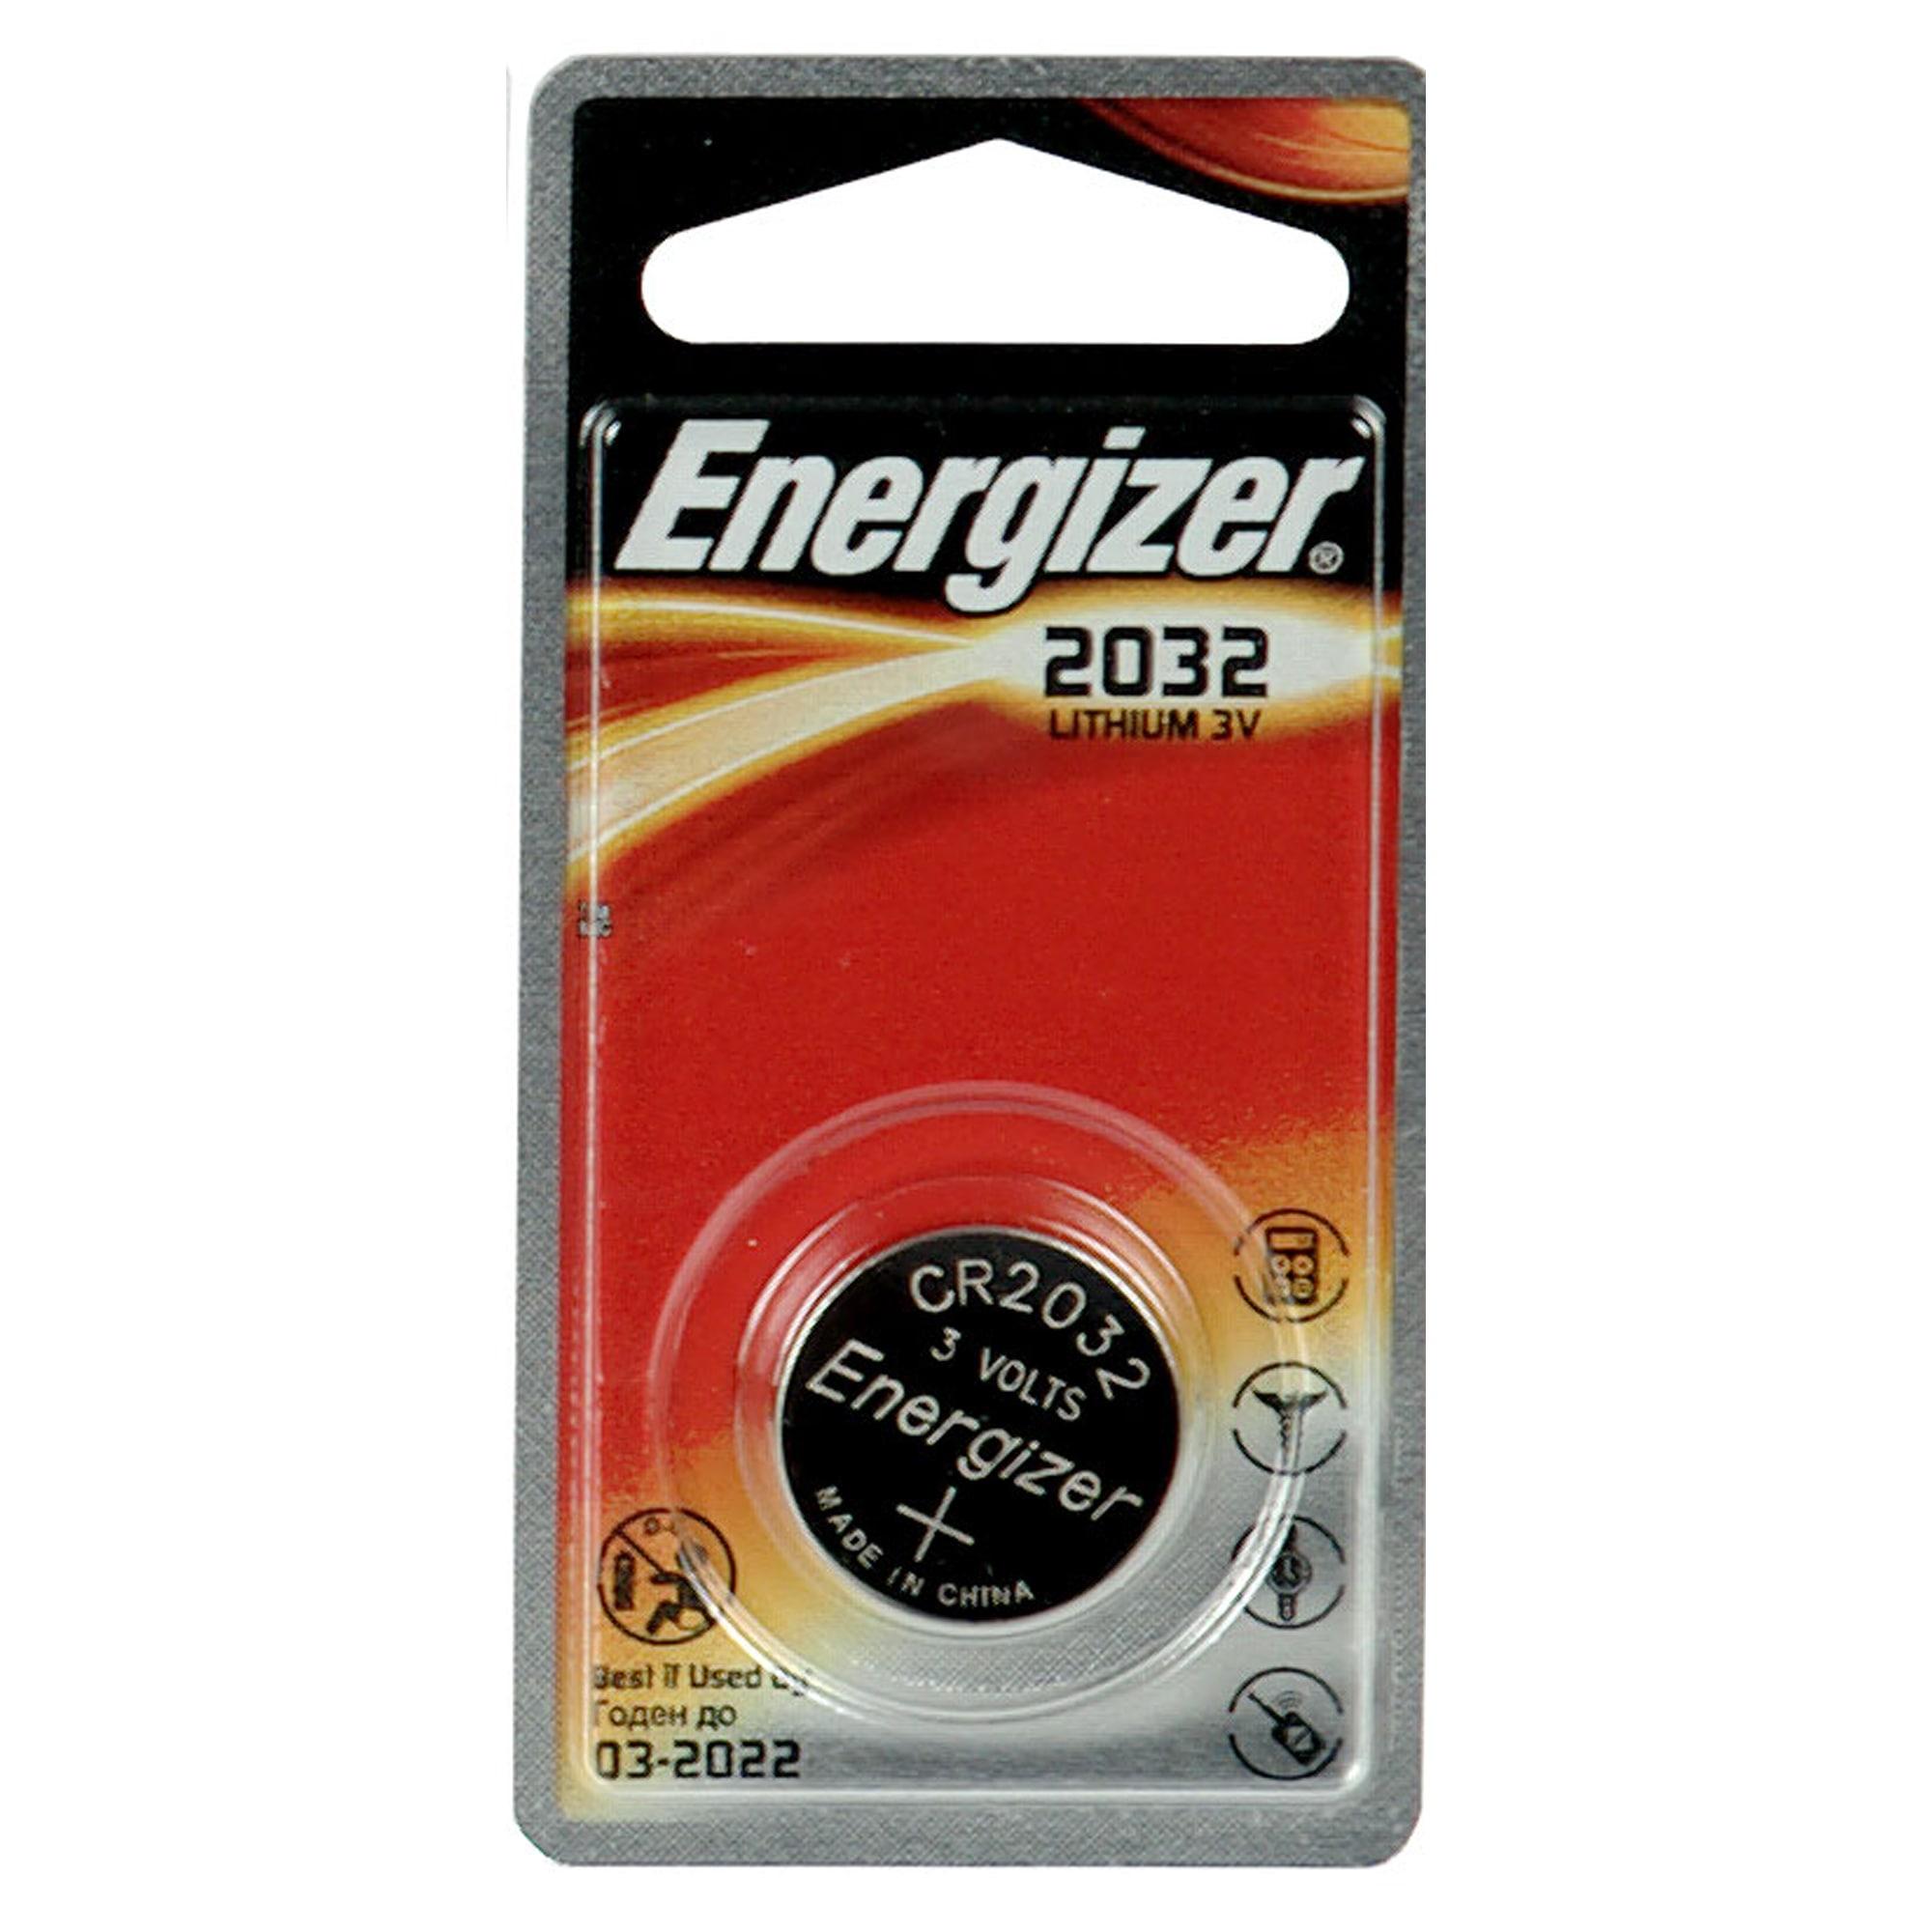 Energizer Lithium Cr2032 1Pk